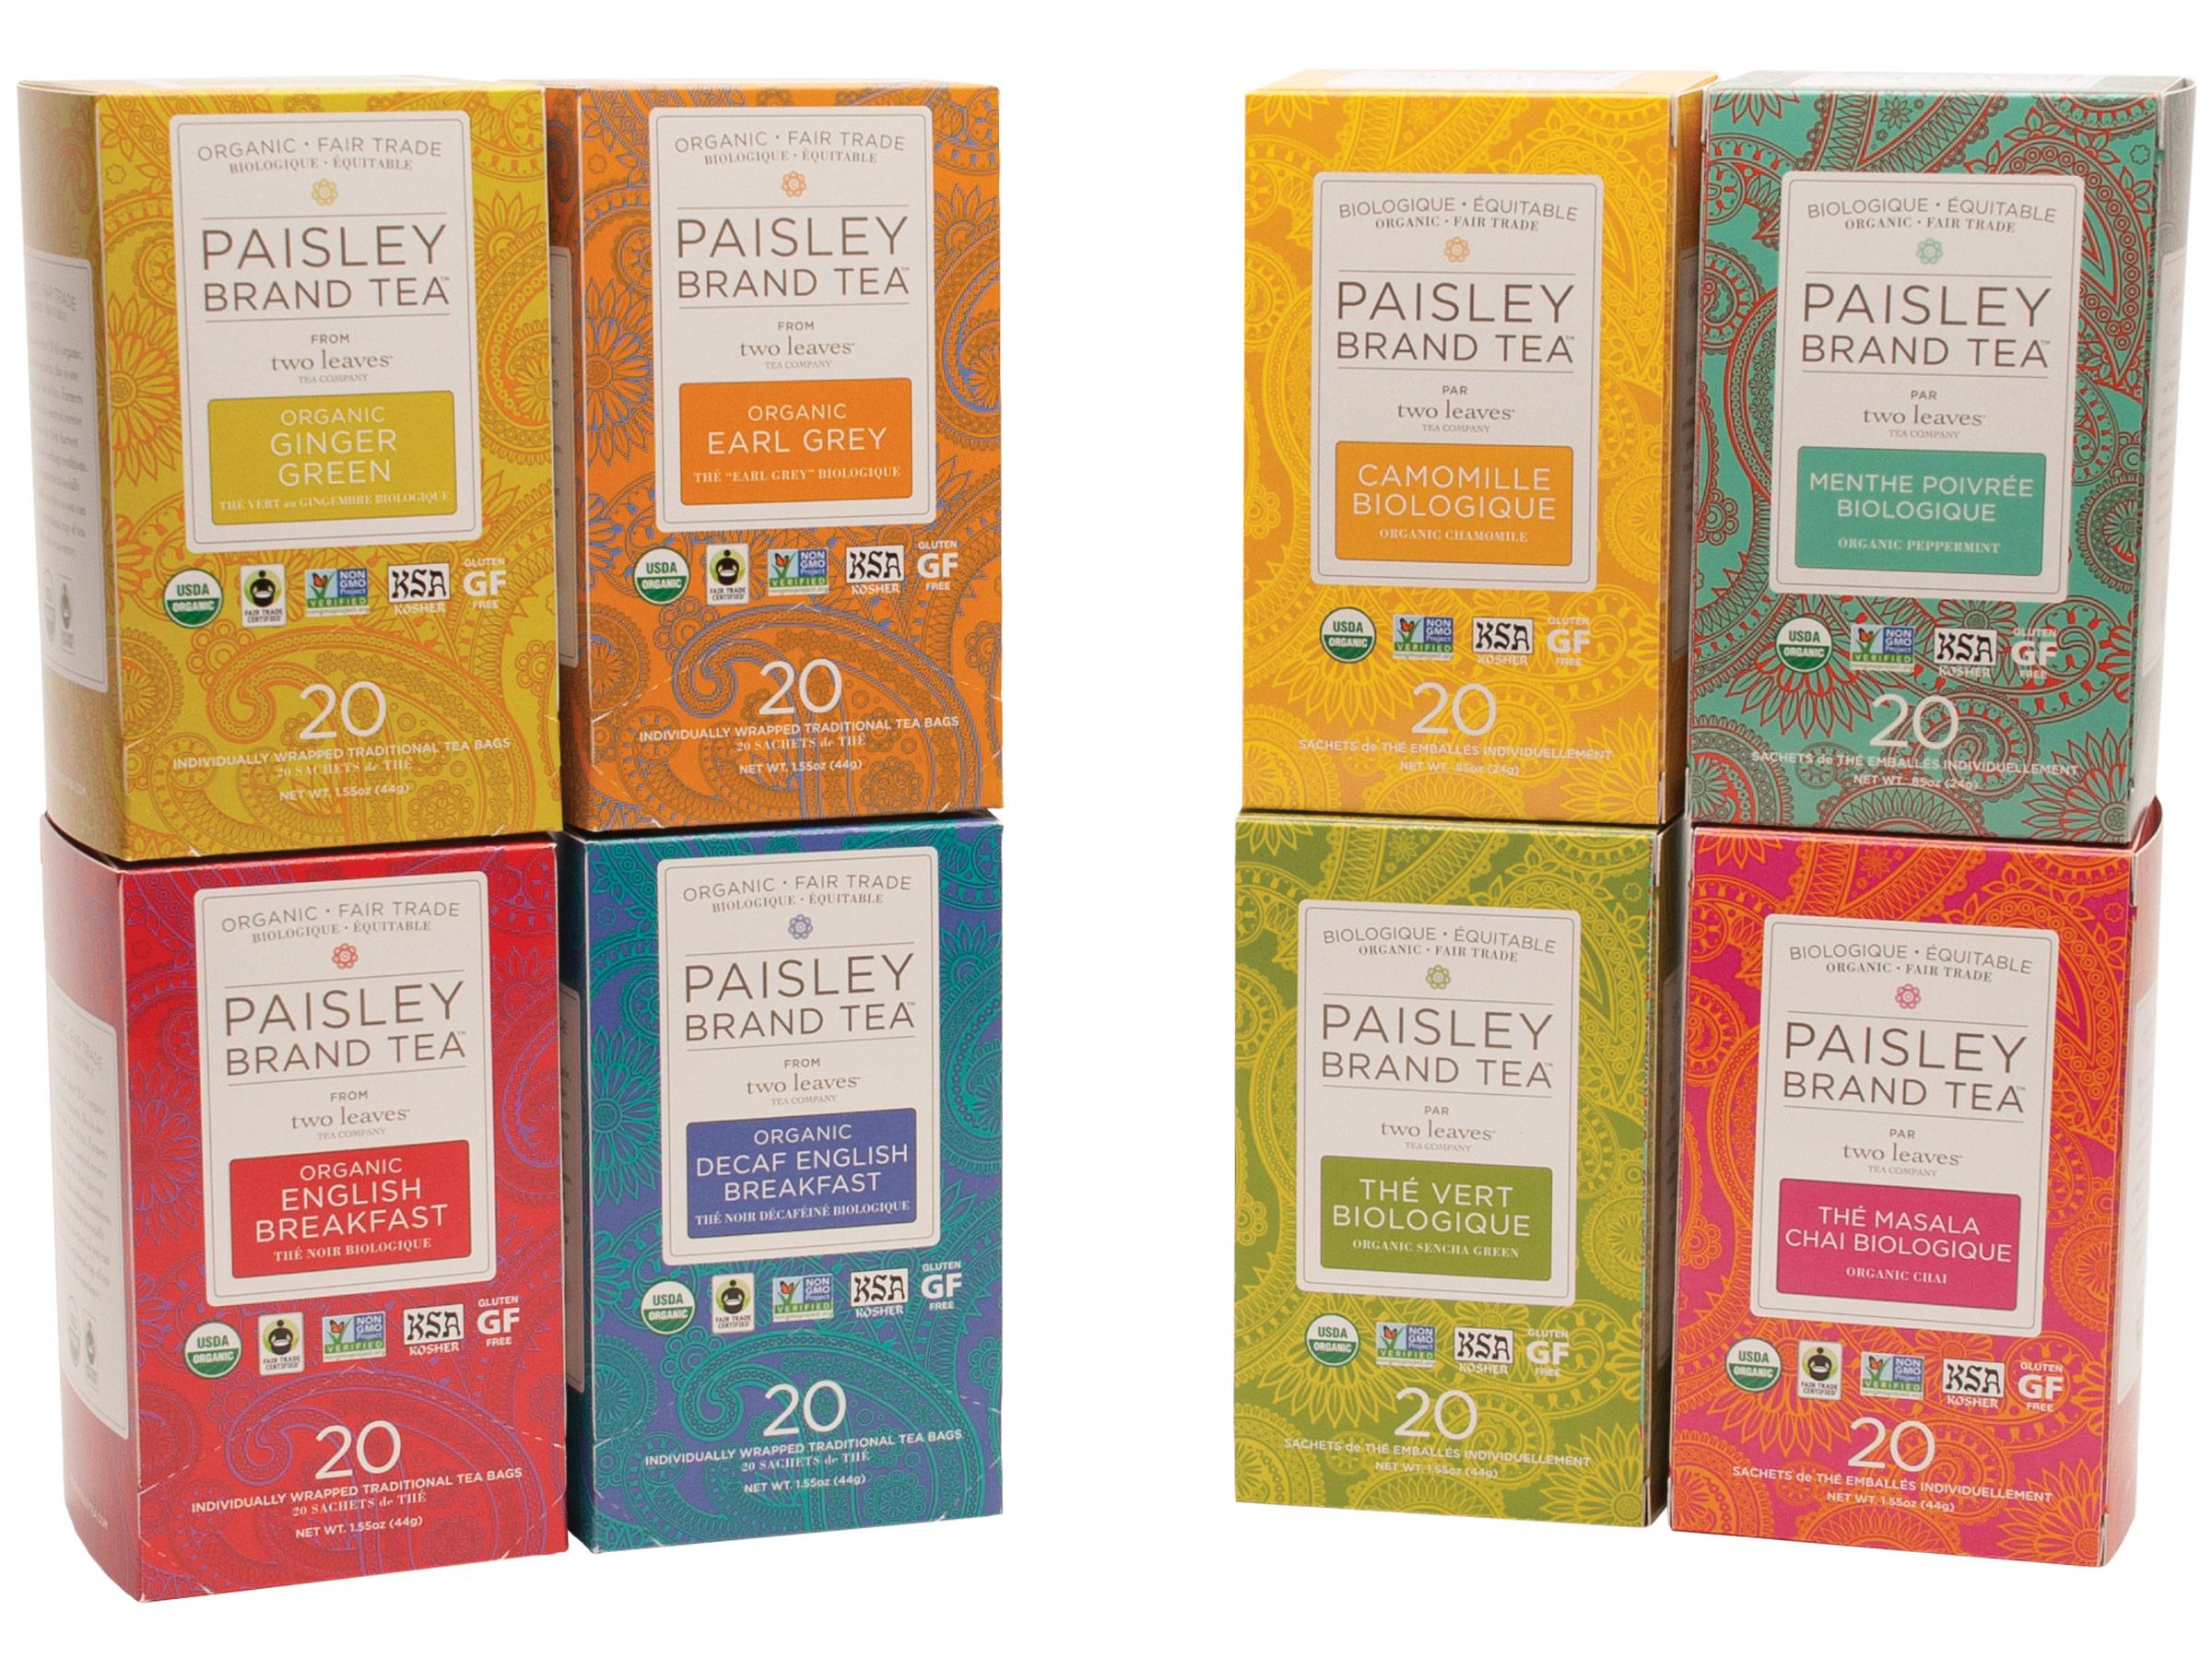 Coffee organic tea - Paisley Brand Tea